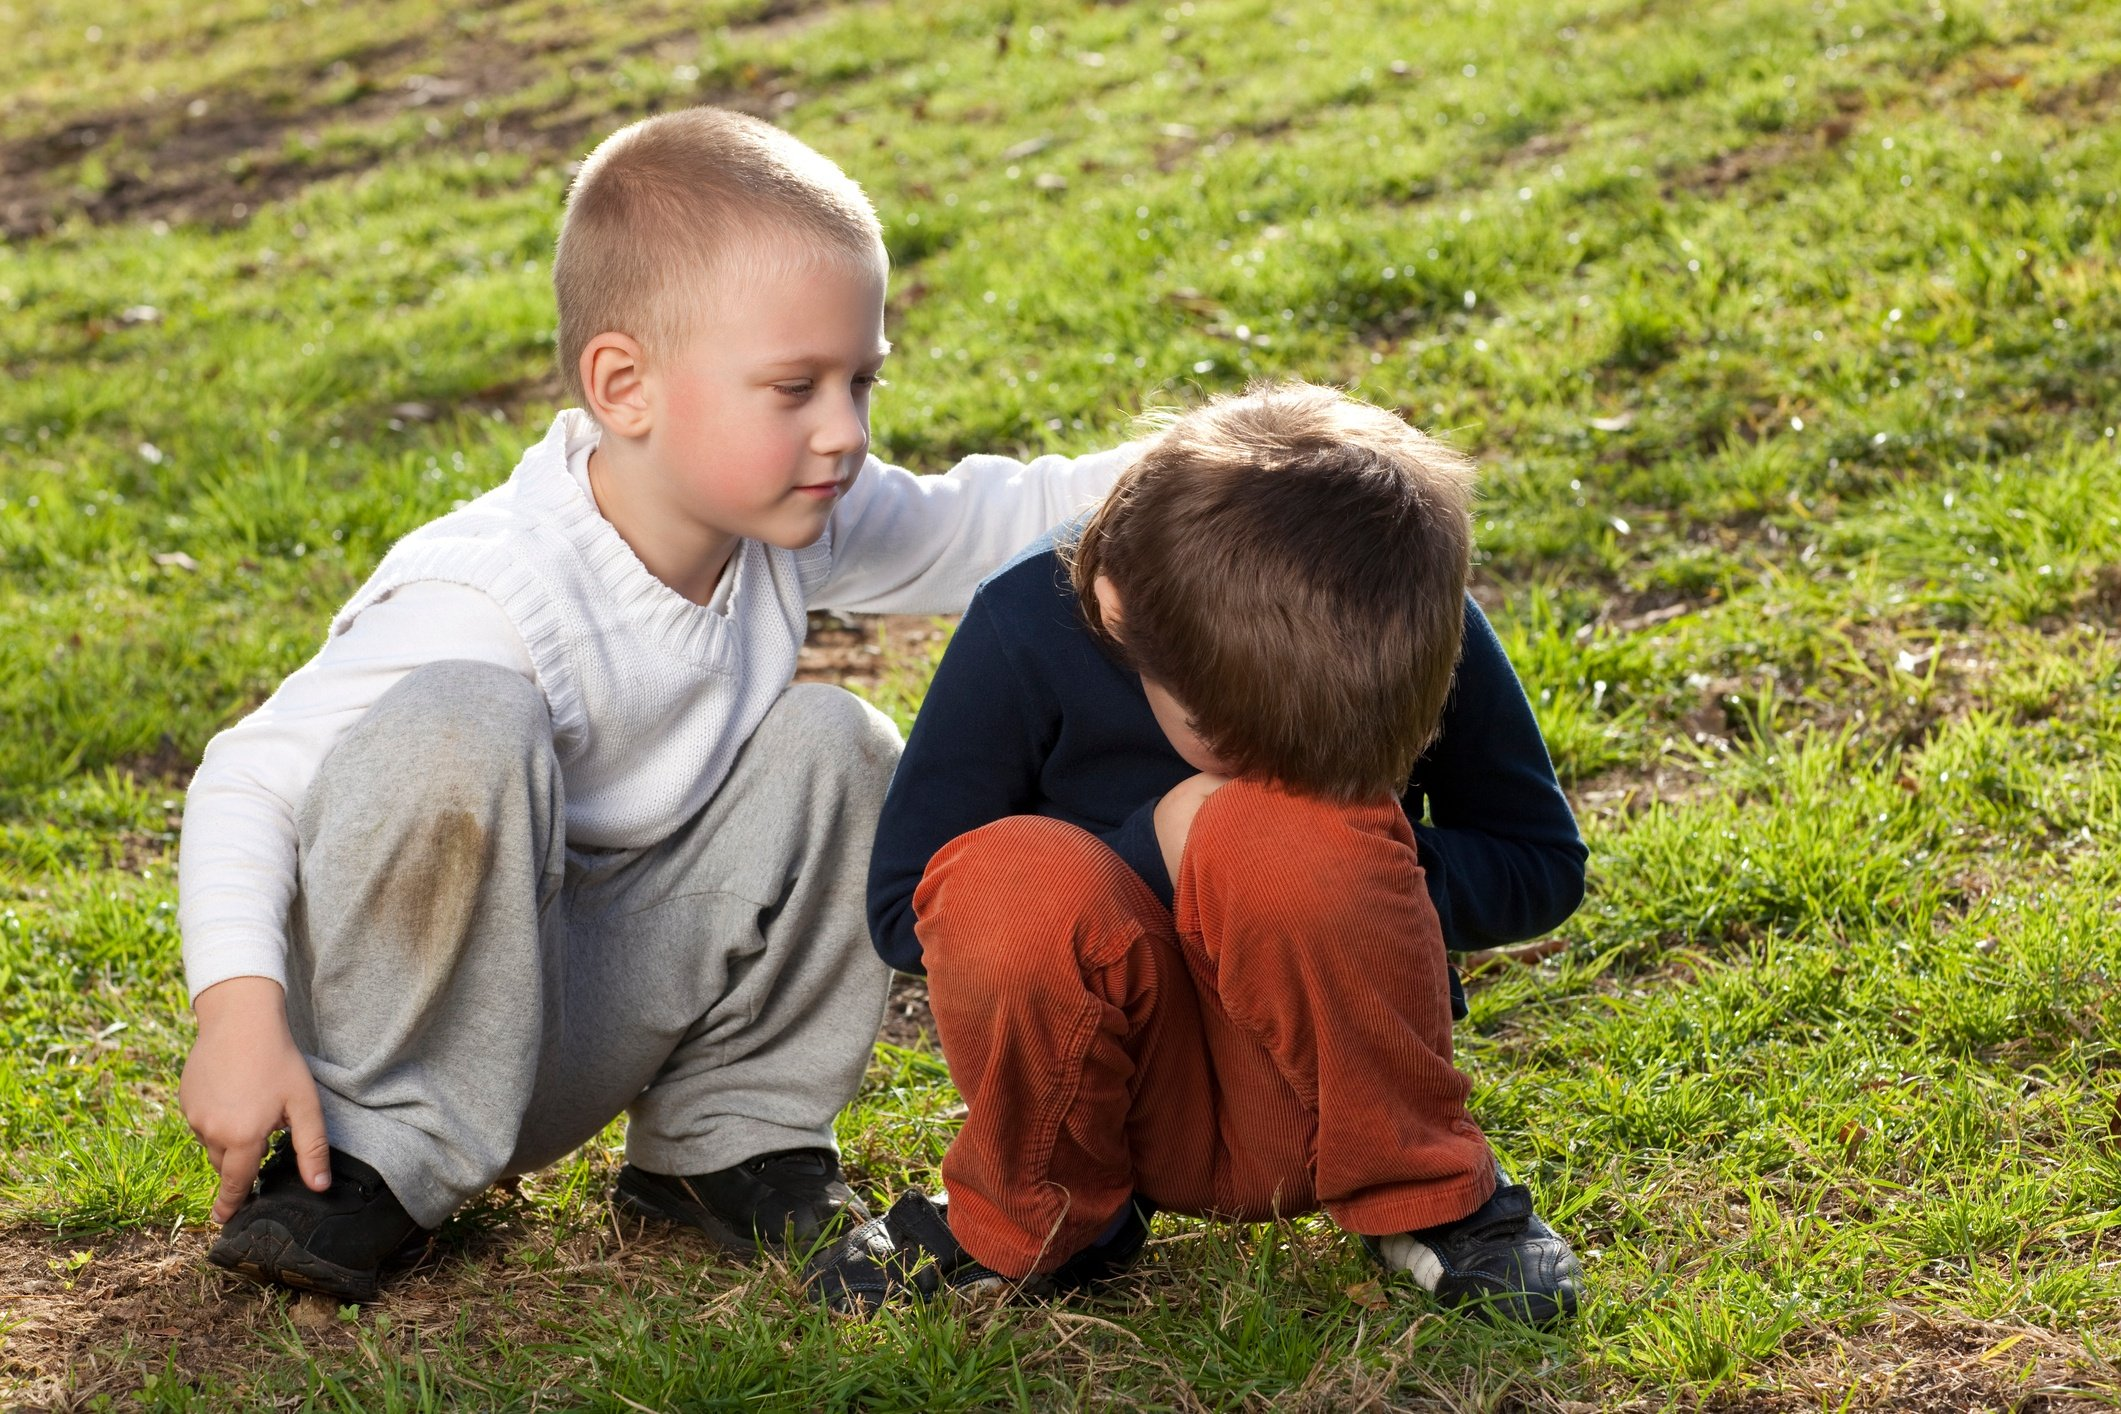 Boy-comforts-a-friend.-154904979_2122x1415-1